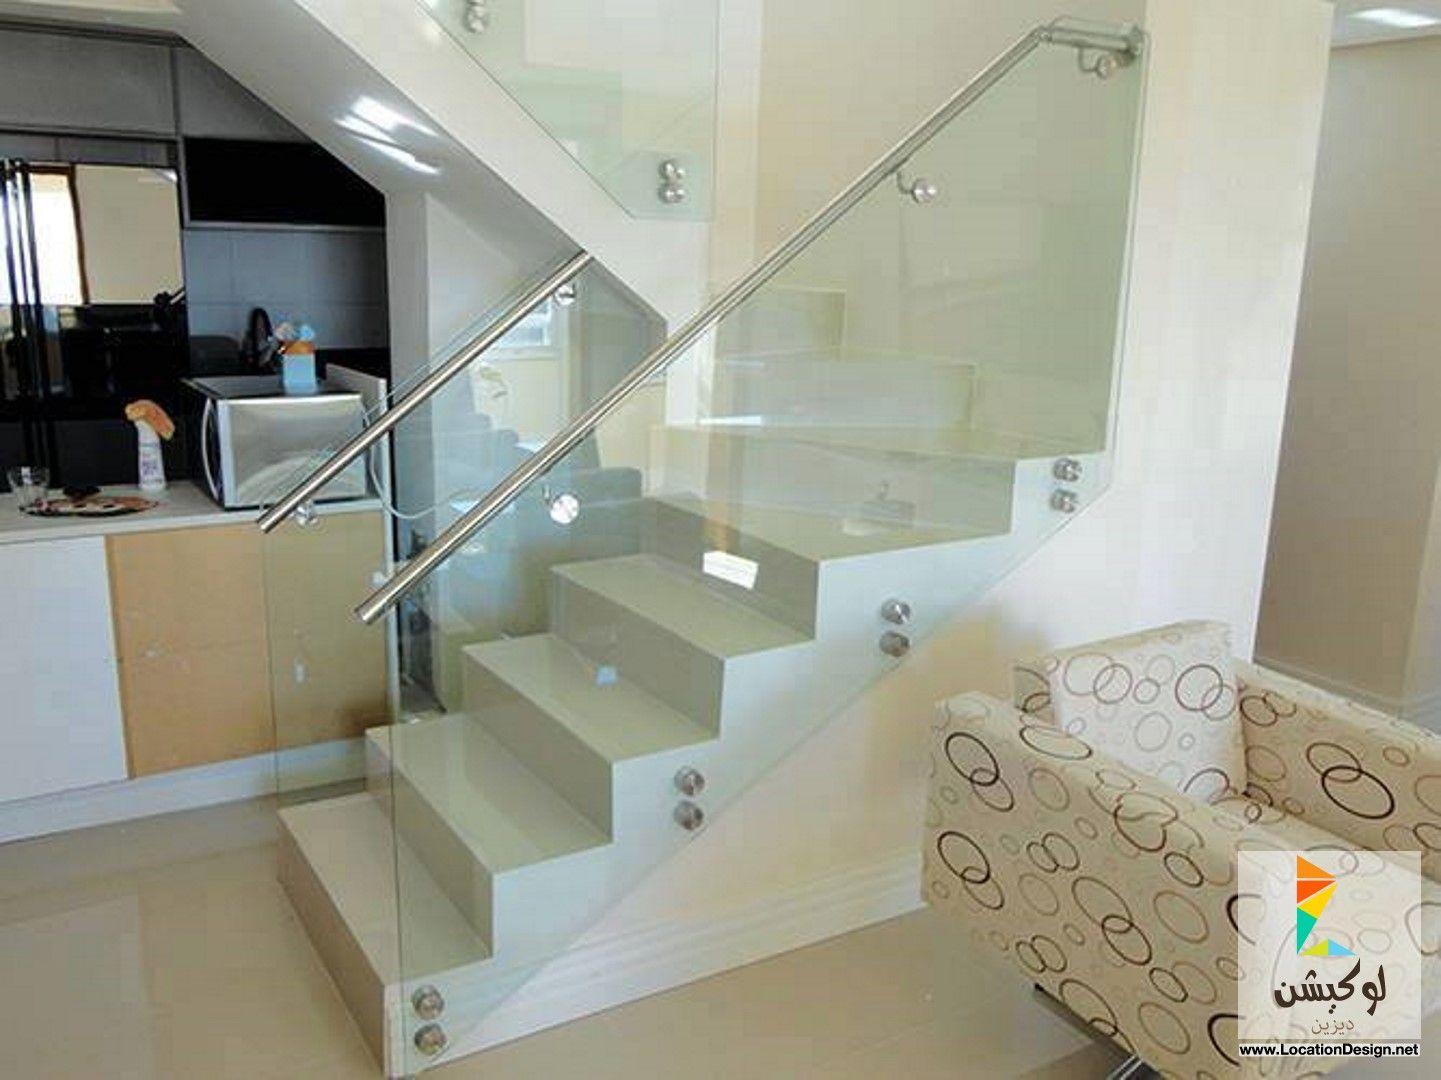 أجمل تصاميم درابزين سلالم زجاج 2015 Stairs Home Decor Decor